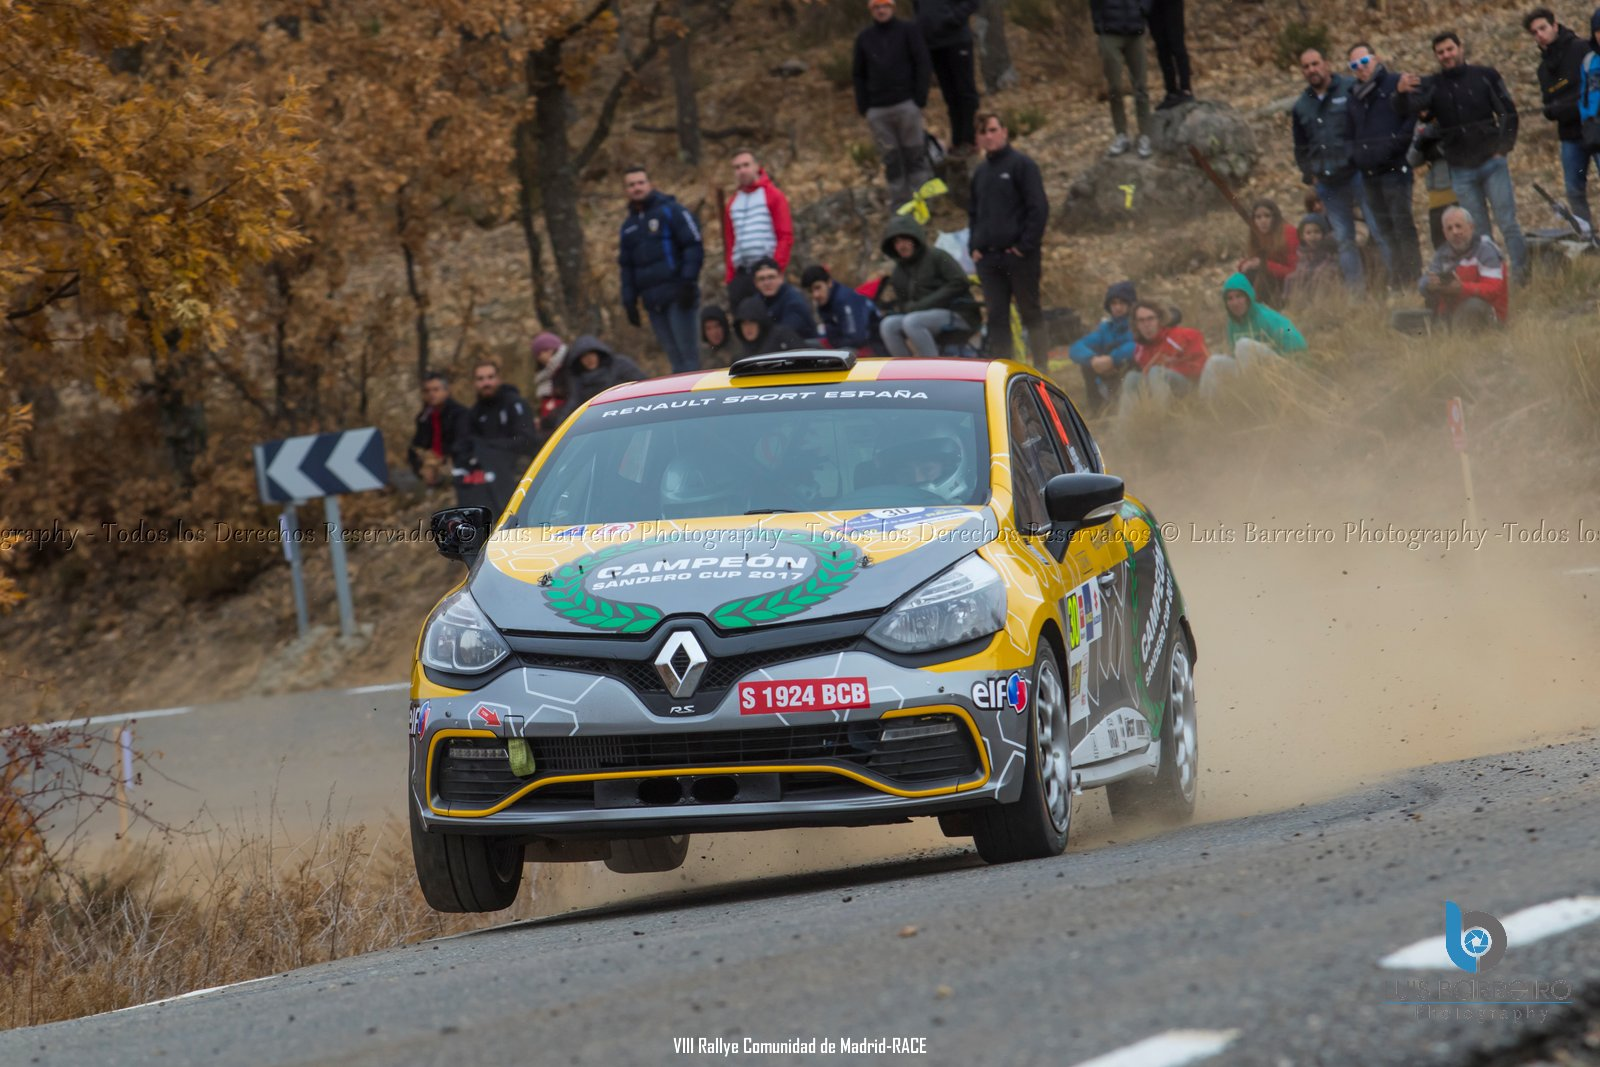 VIII Rallye Comunidad Madrid-RACE